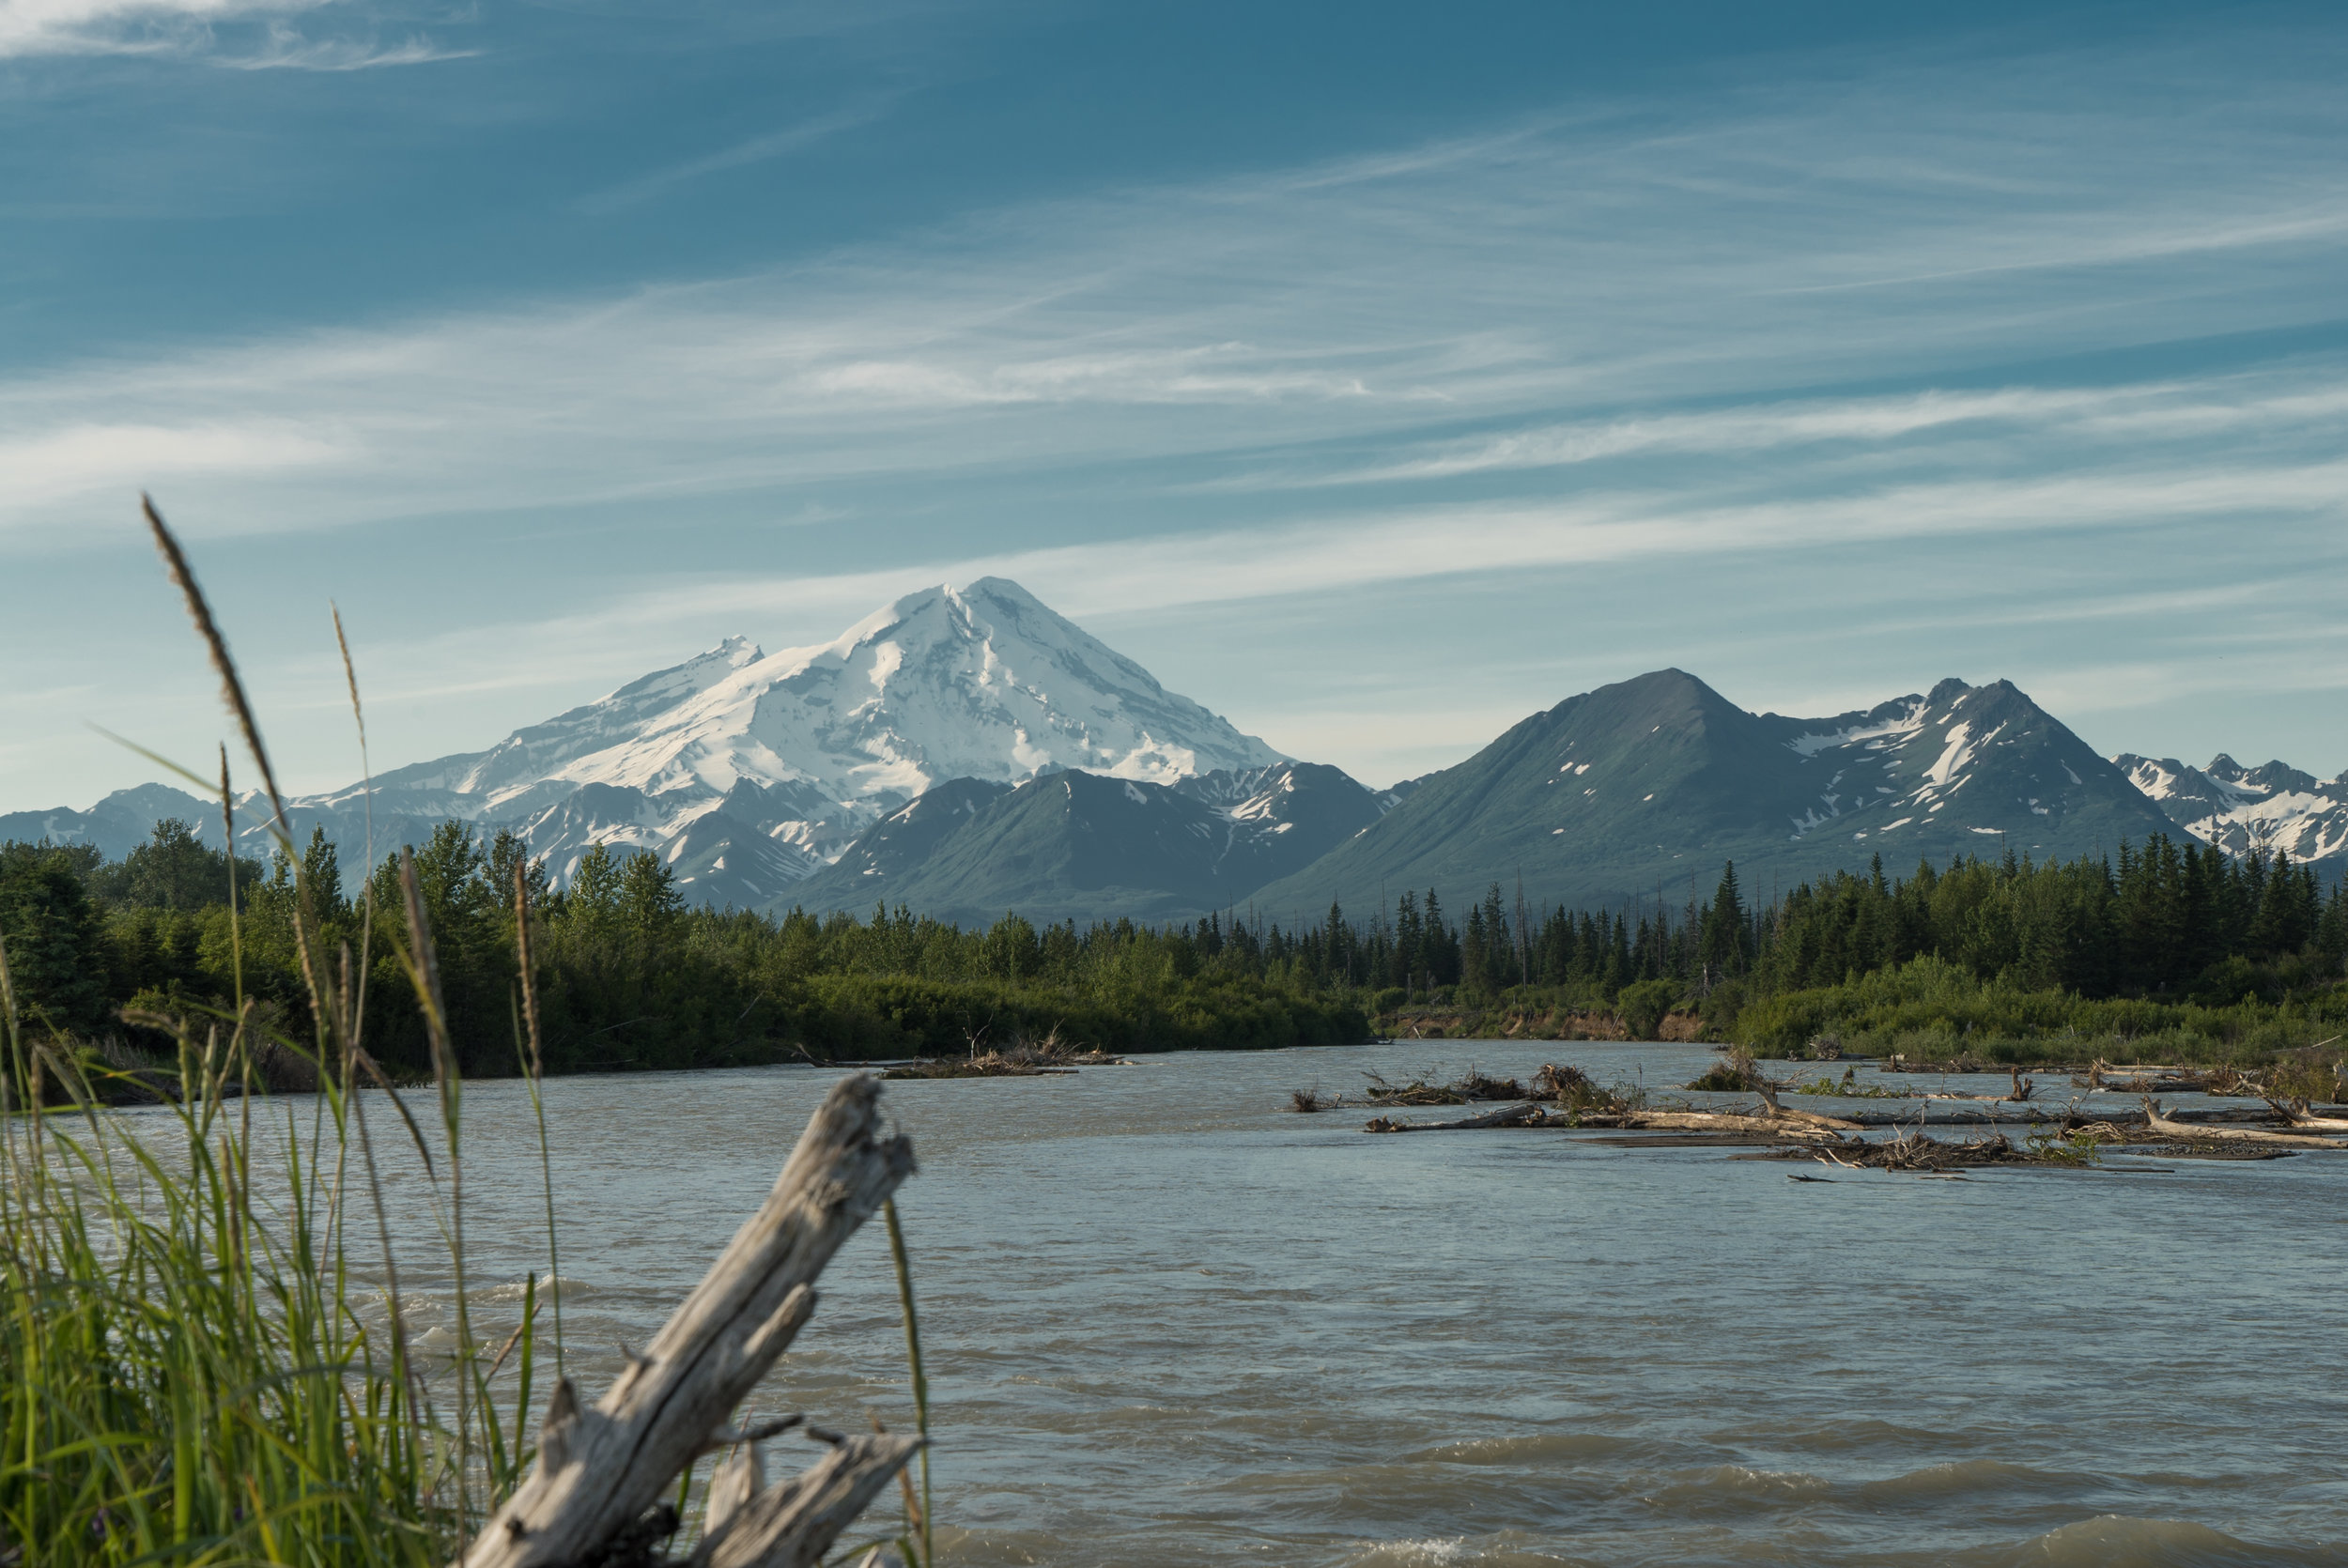 snug-harbor-alaska-Photo-by-Aaron-Minks-DSC06863.jpg